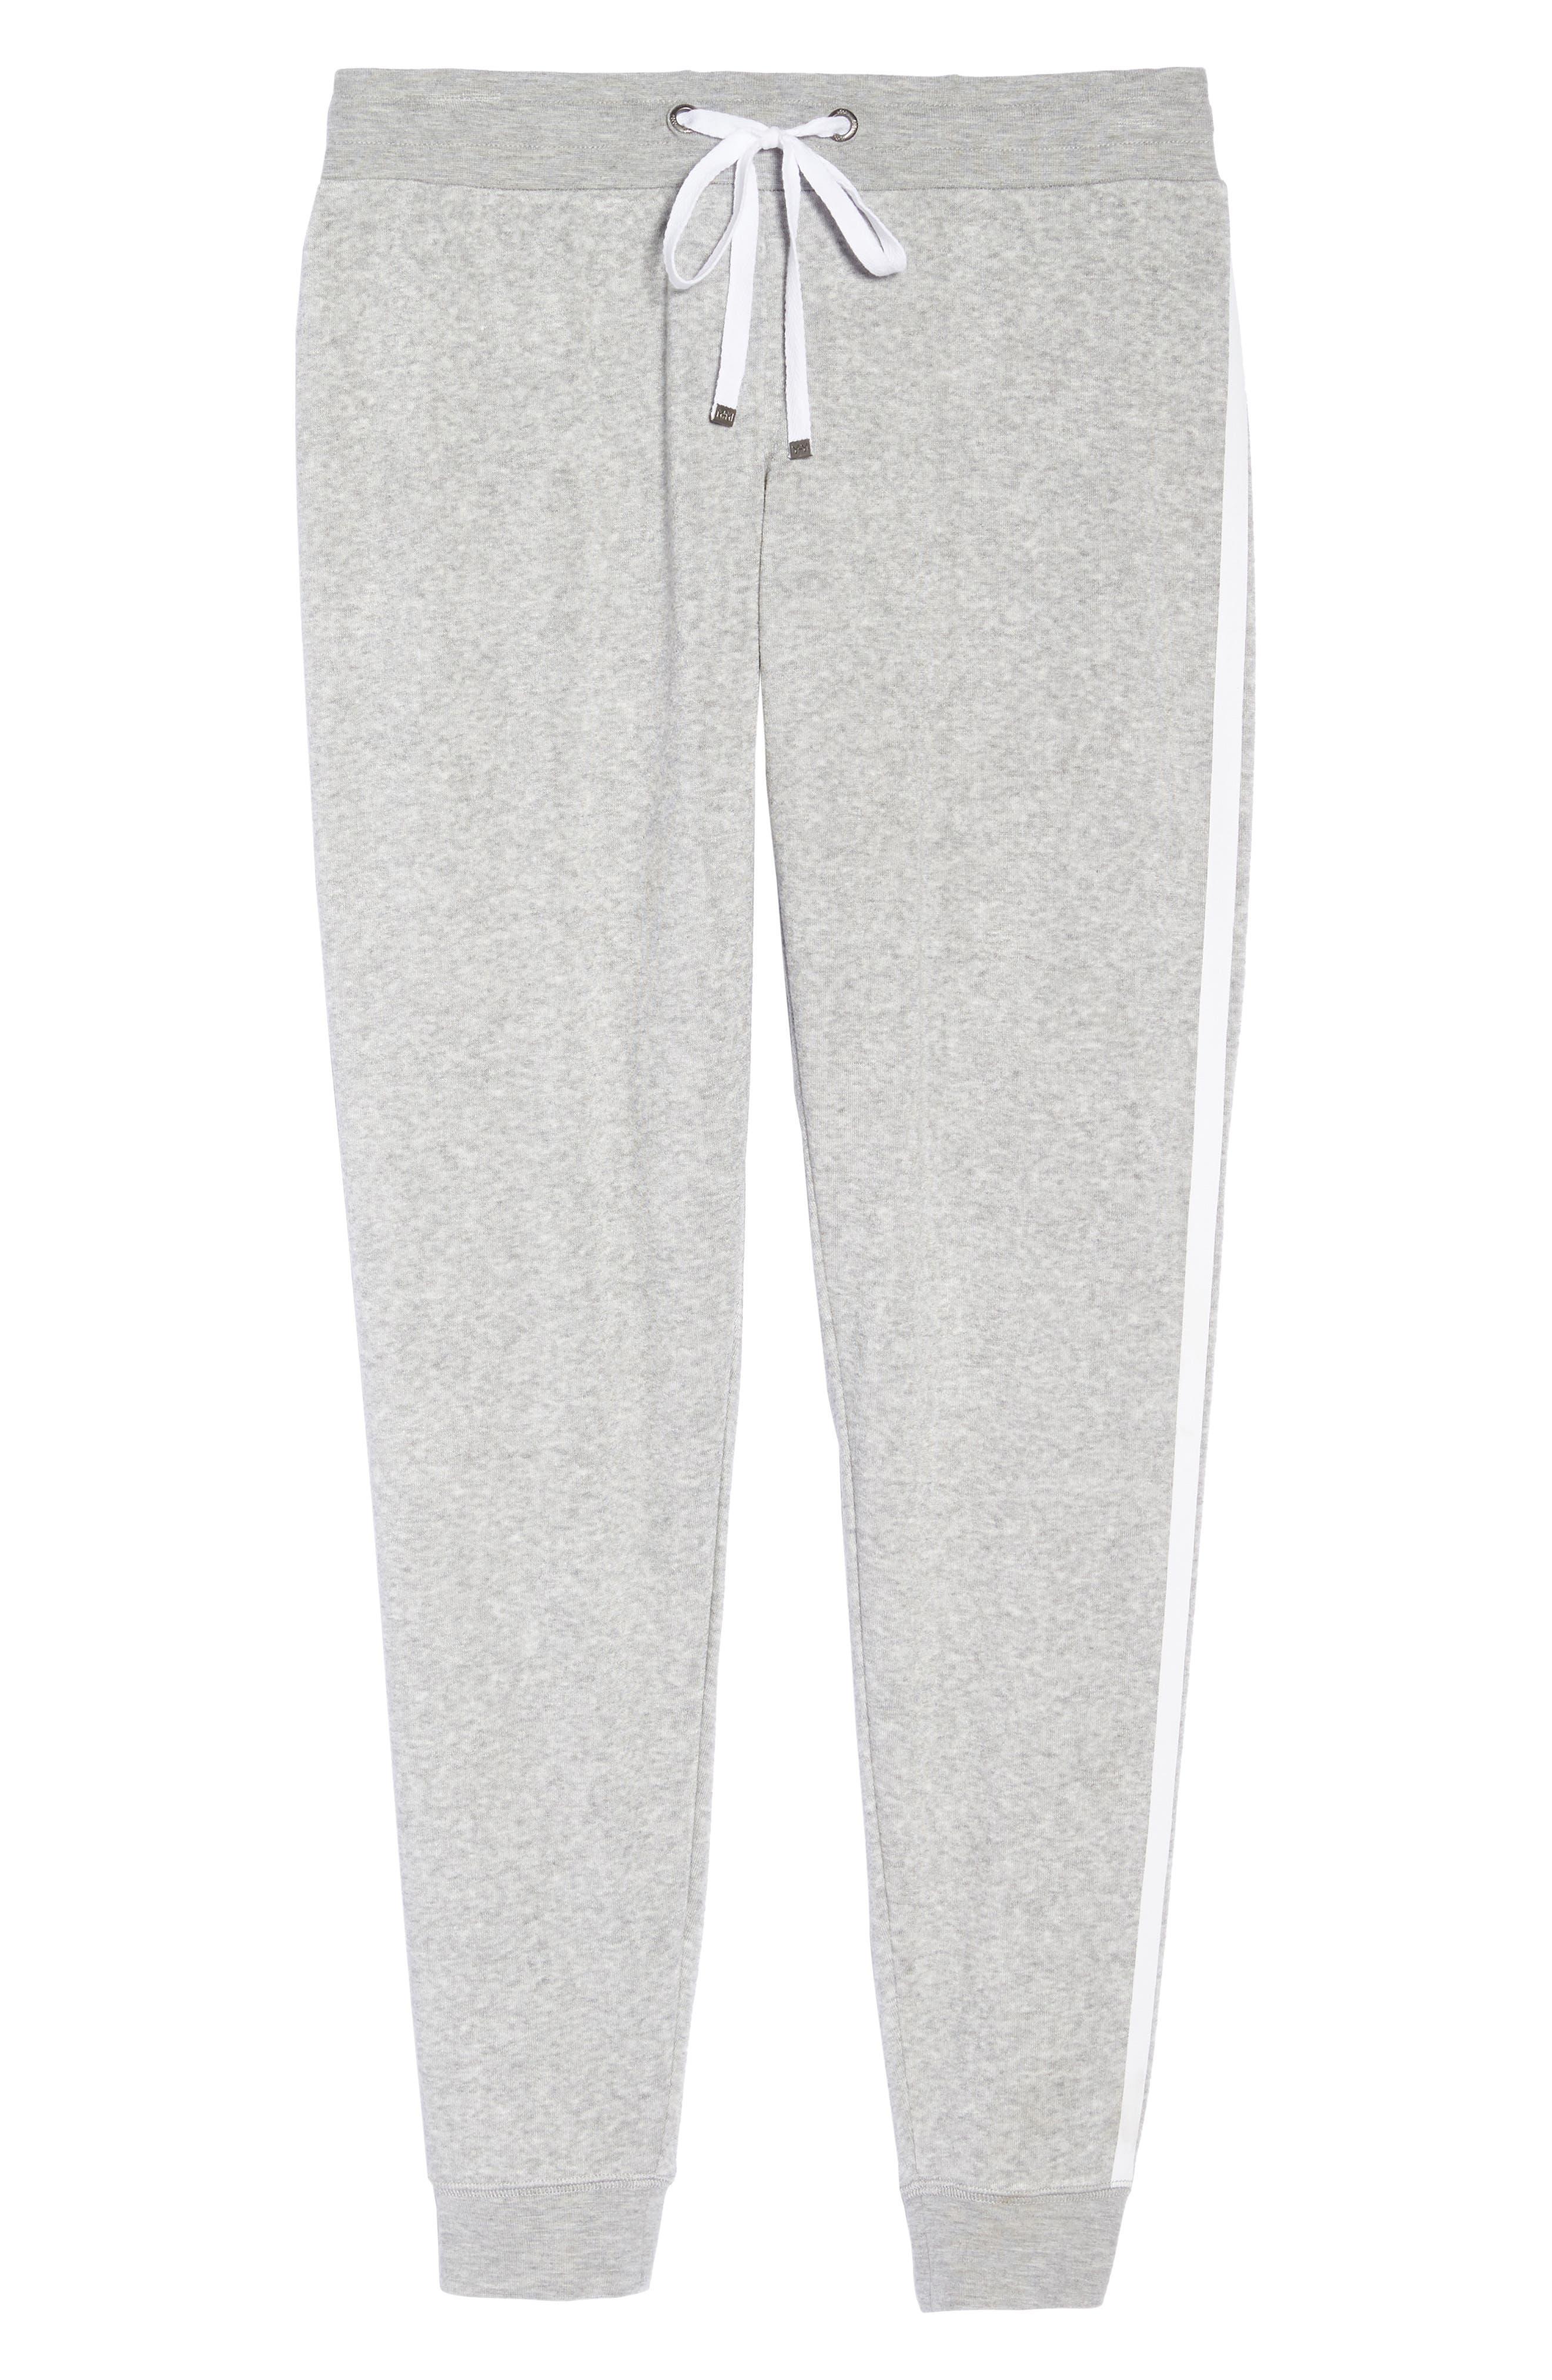 Firecracker Jogger Pajama Pants,                             Alternate thumbnail 6, color,                             021